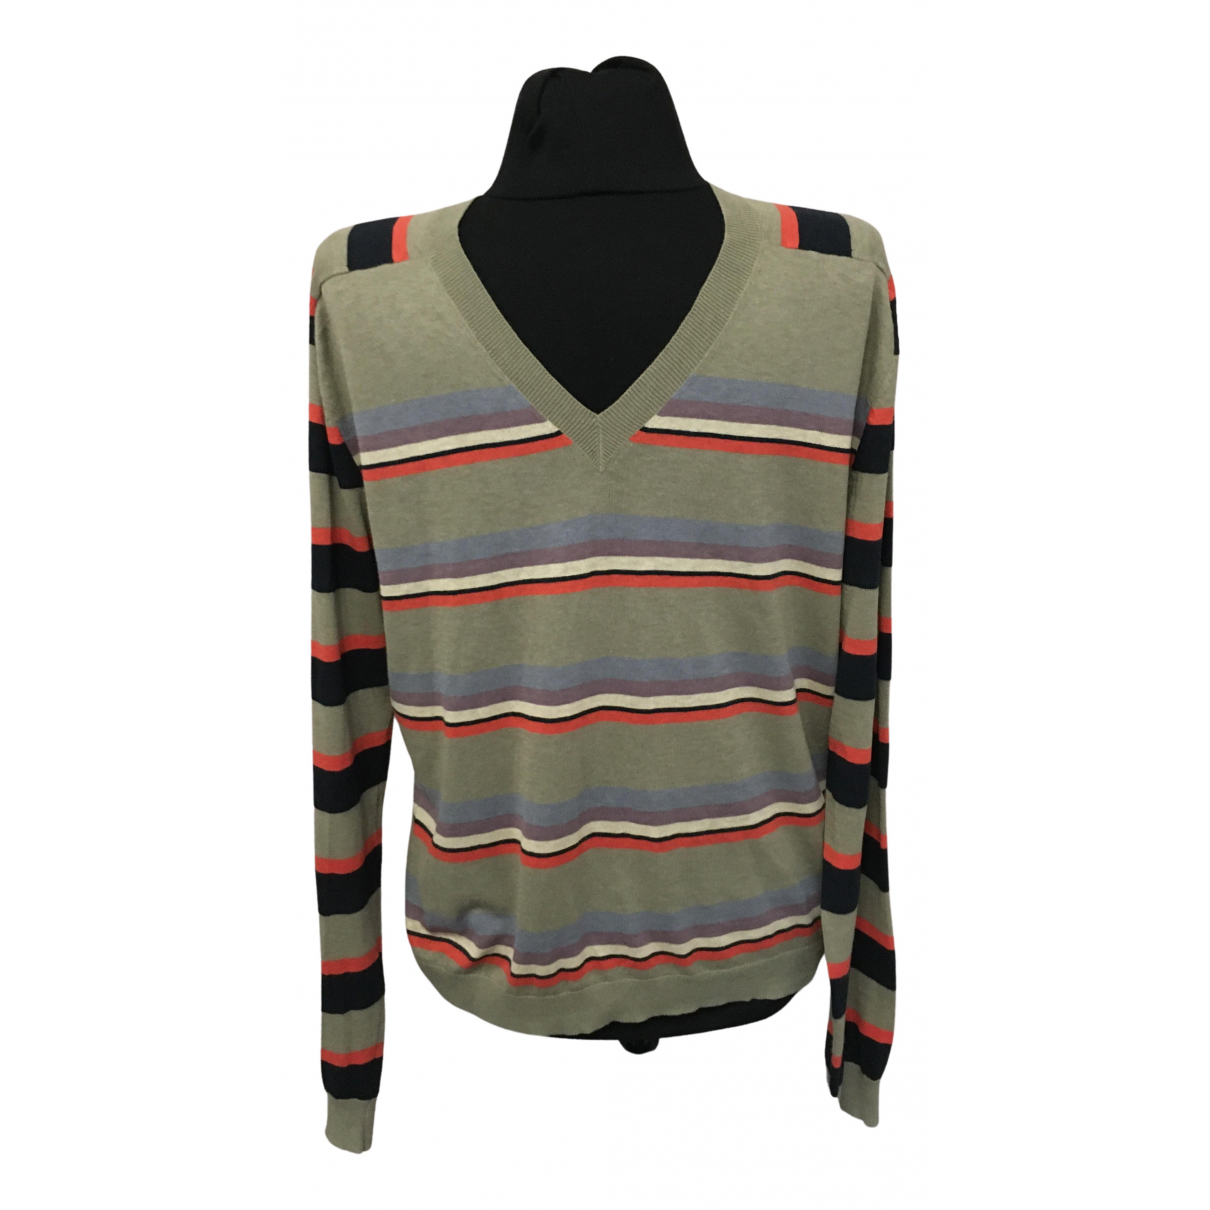 Marc By Marc Jacobs N Multicolour Cotton Knitwear & Sweatshirts for Men L International